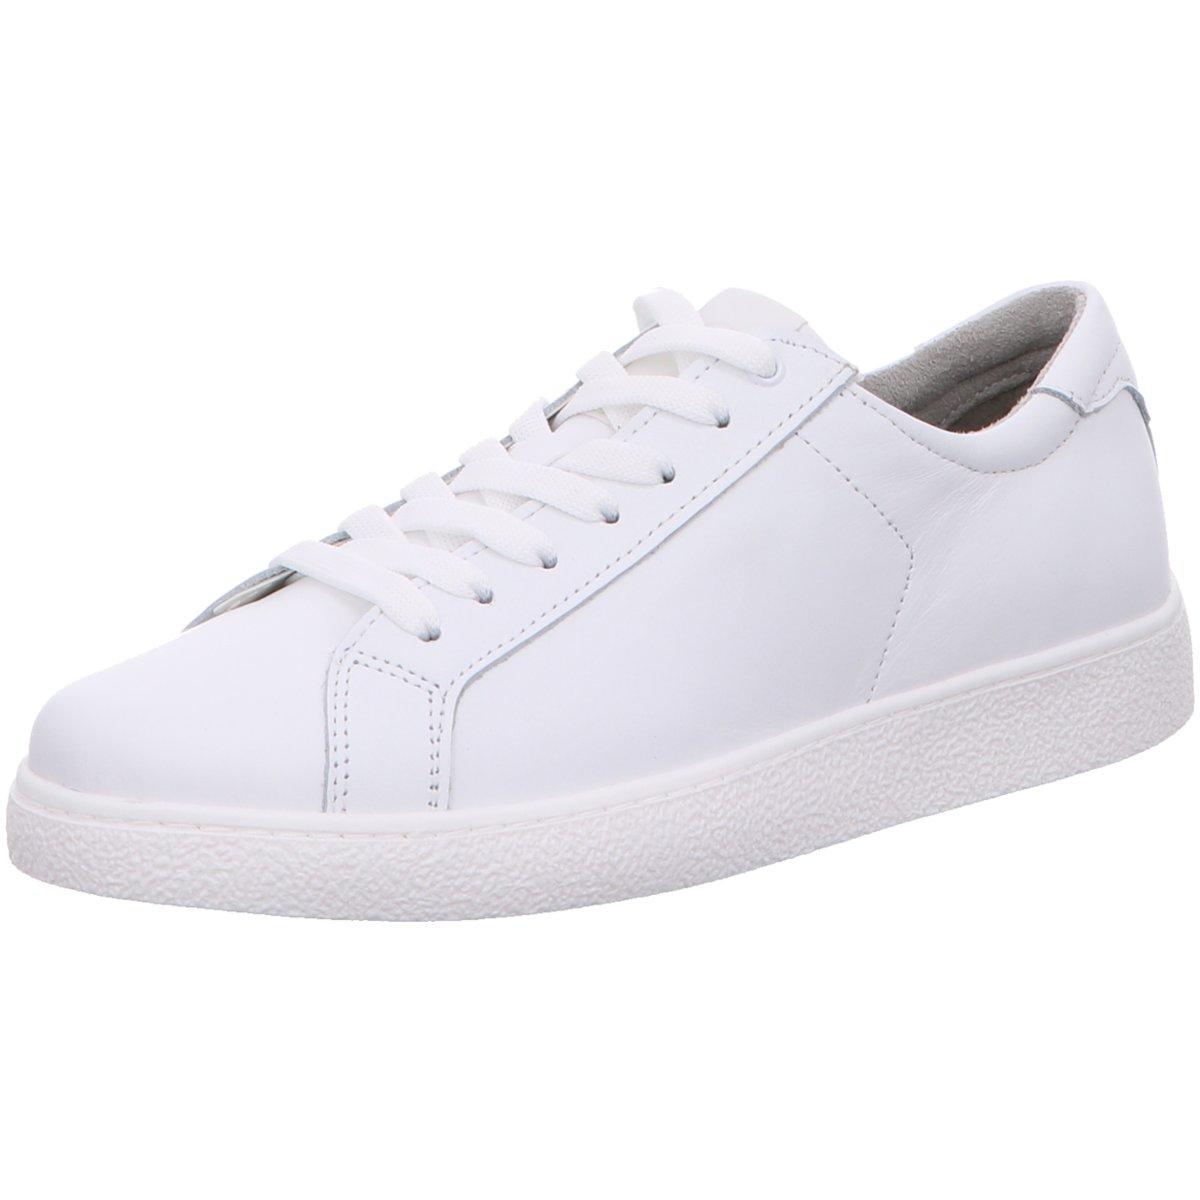 Tamaris Damen Sneaker weiß 835191 | eBay